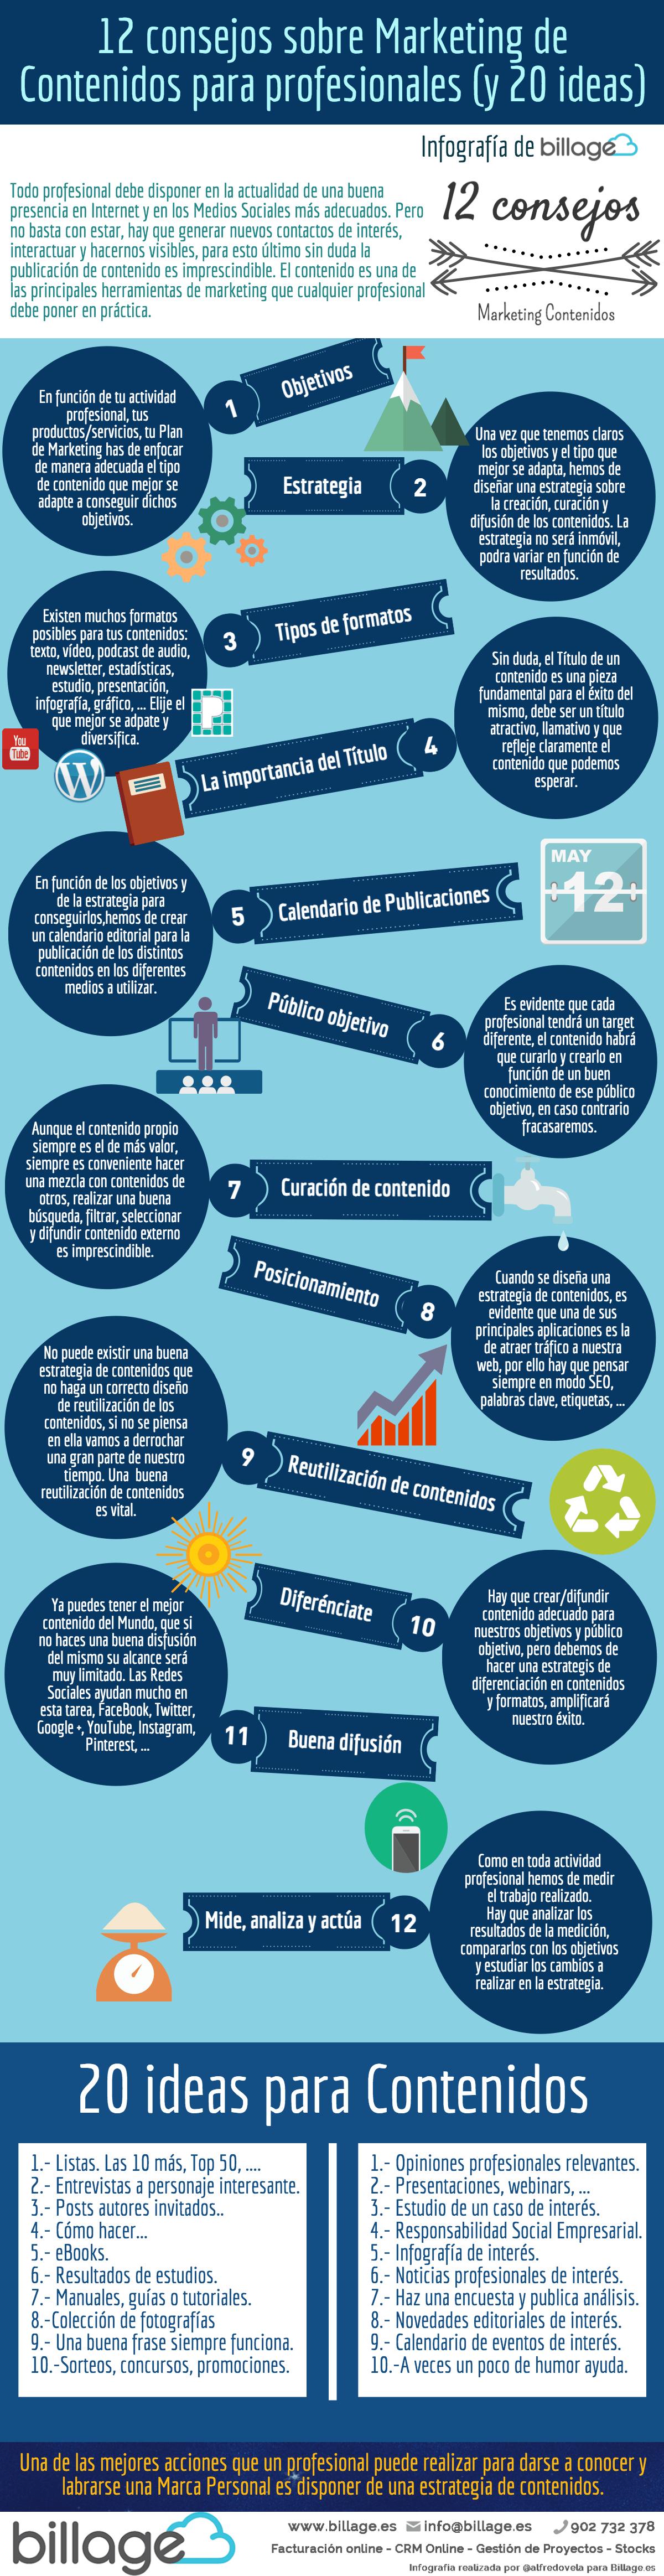 10-consejos-marketing-contenidos-infografia-conflict-copy-1